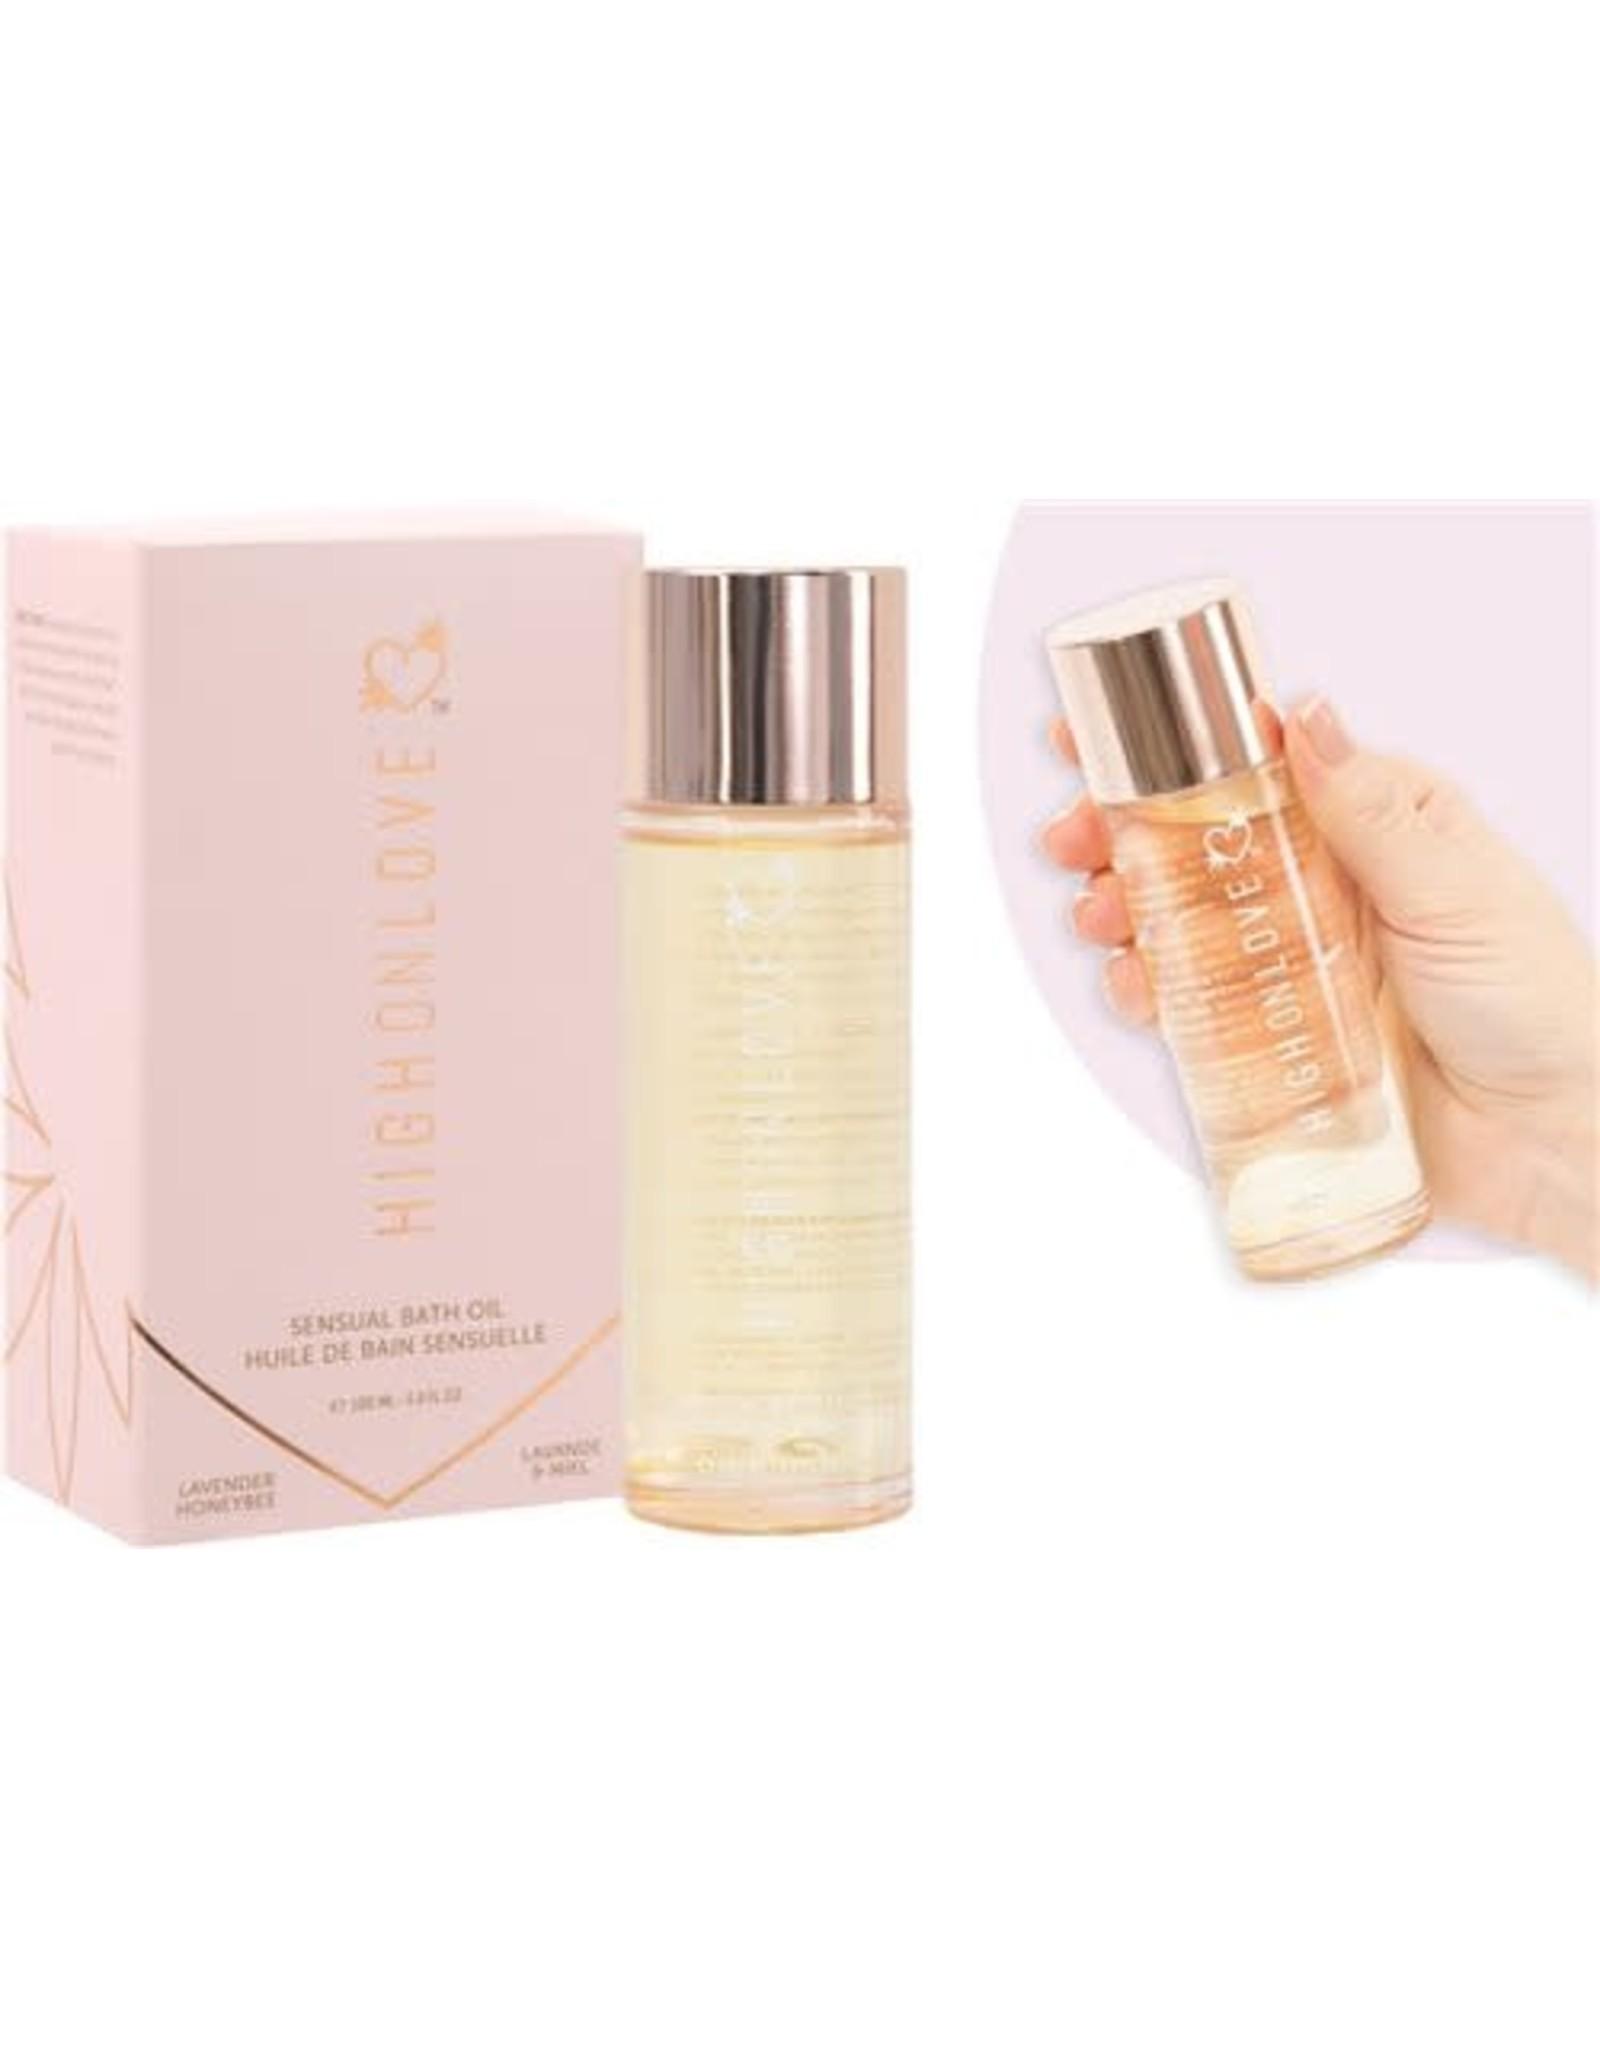 High On Love Sensual Bath Oil Lavender/Honeybee 3.4oz